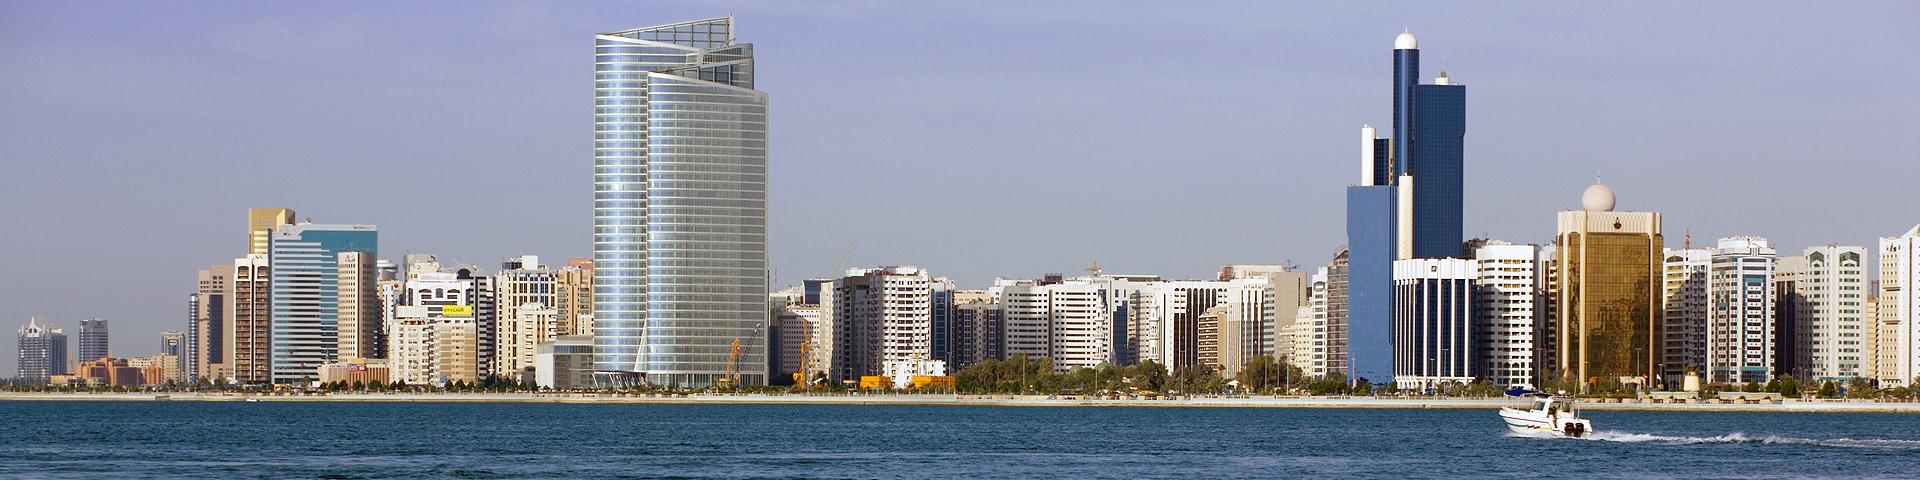 AbuDhabi Corniche